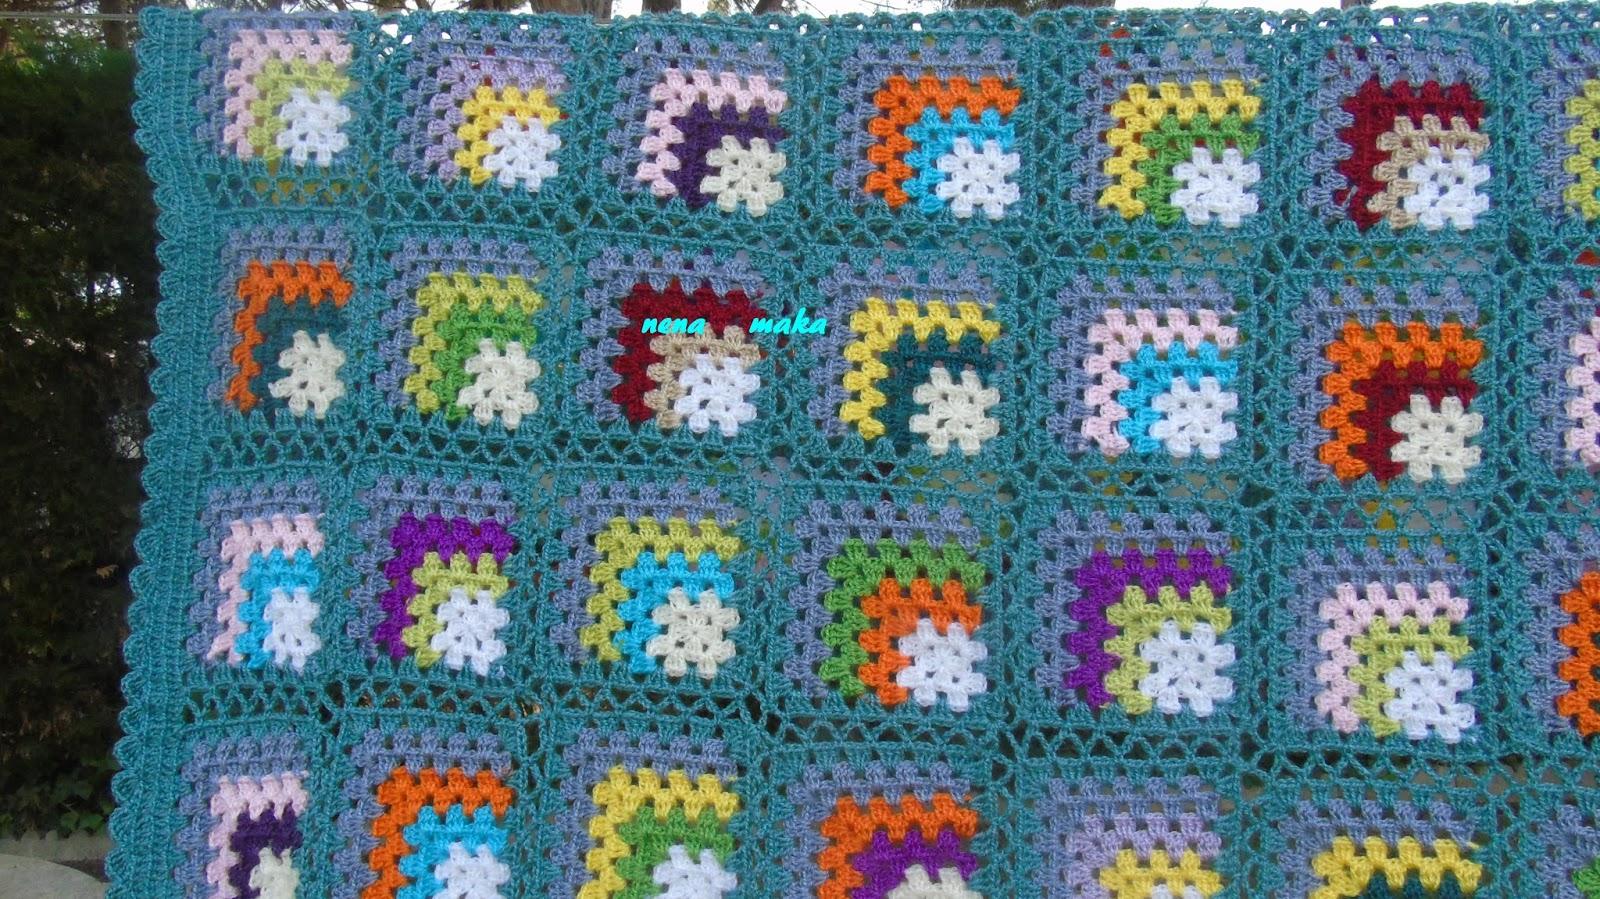 Mis puntaditas escondidas colcha de ganchillo - Mantas de crochet a cuadros ...